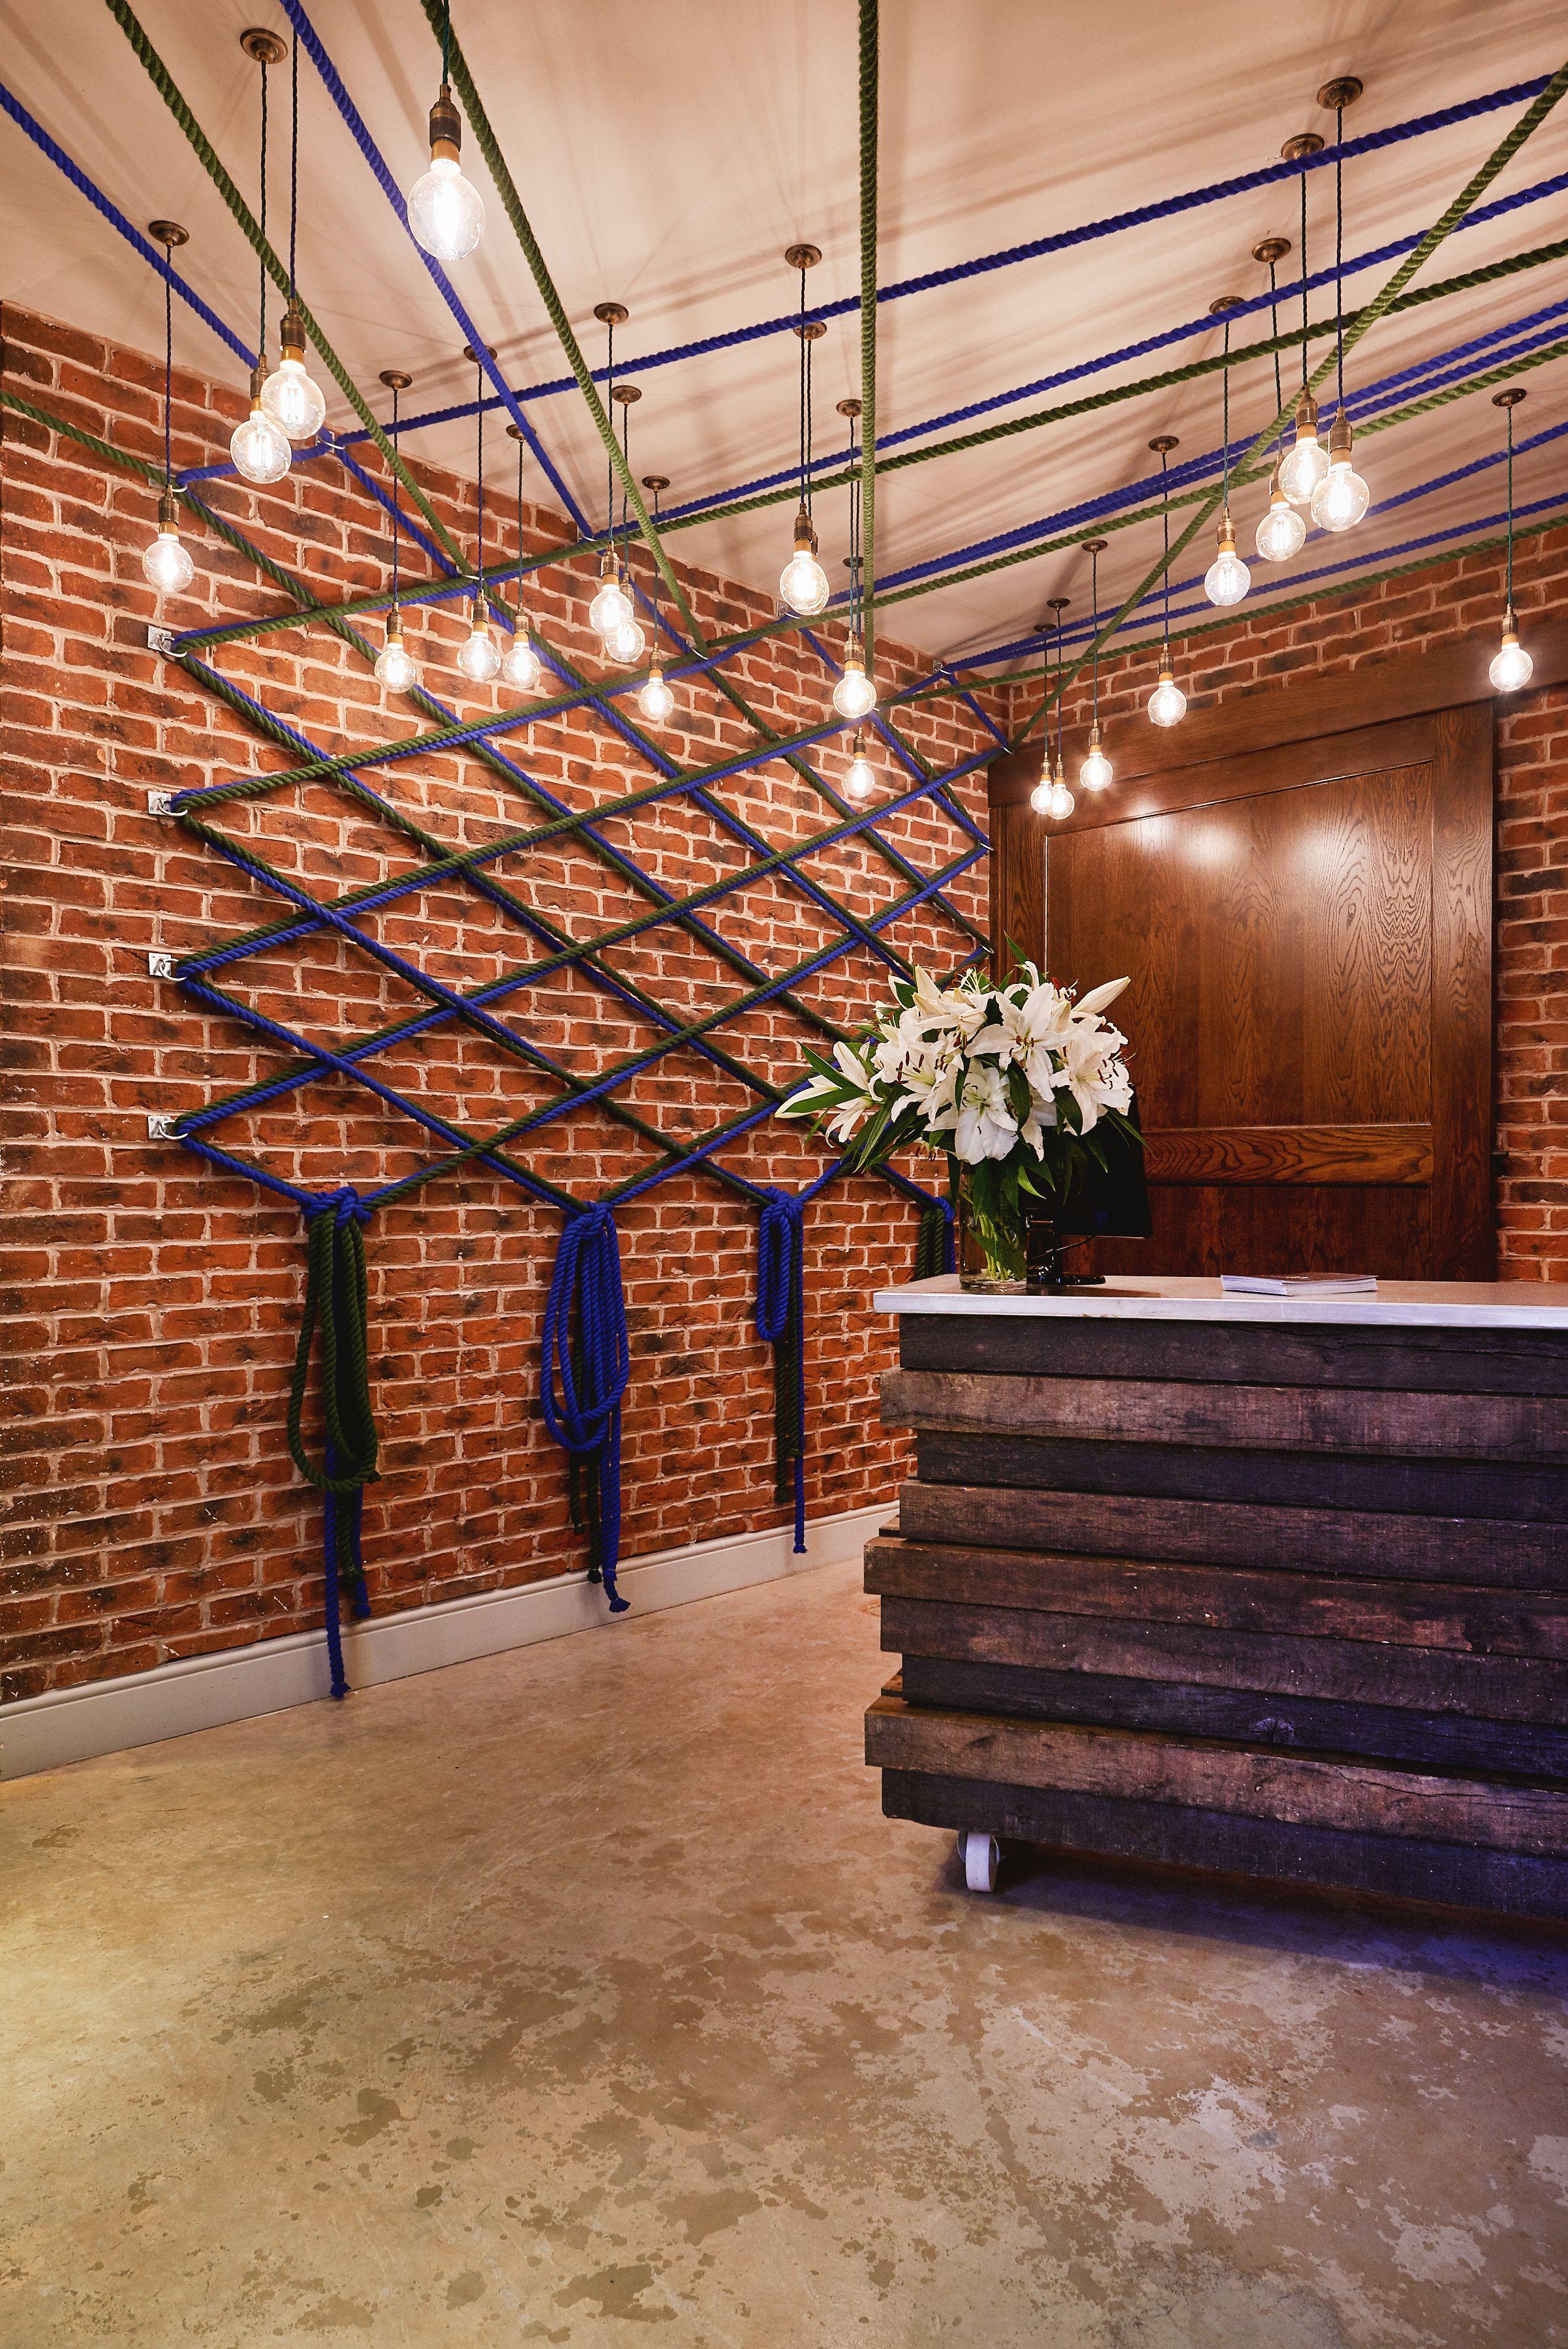 Horizontal Timber Chunky Blue Grey Stained Bar Detail Polished Concrete Floor Against Rich Warm Brick Textu Restaurant Design Bar Design Restaurant Rope Decor